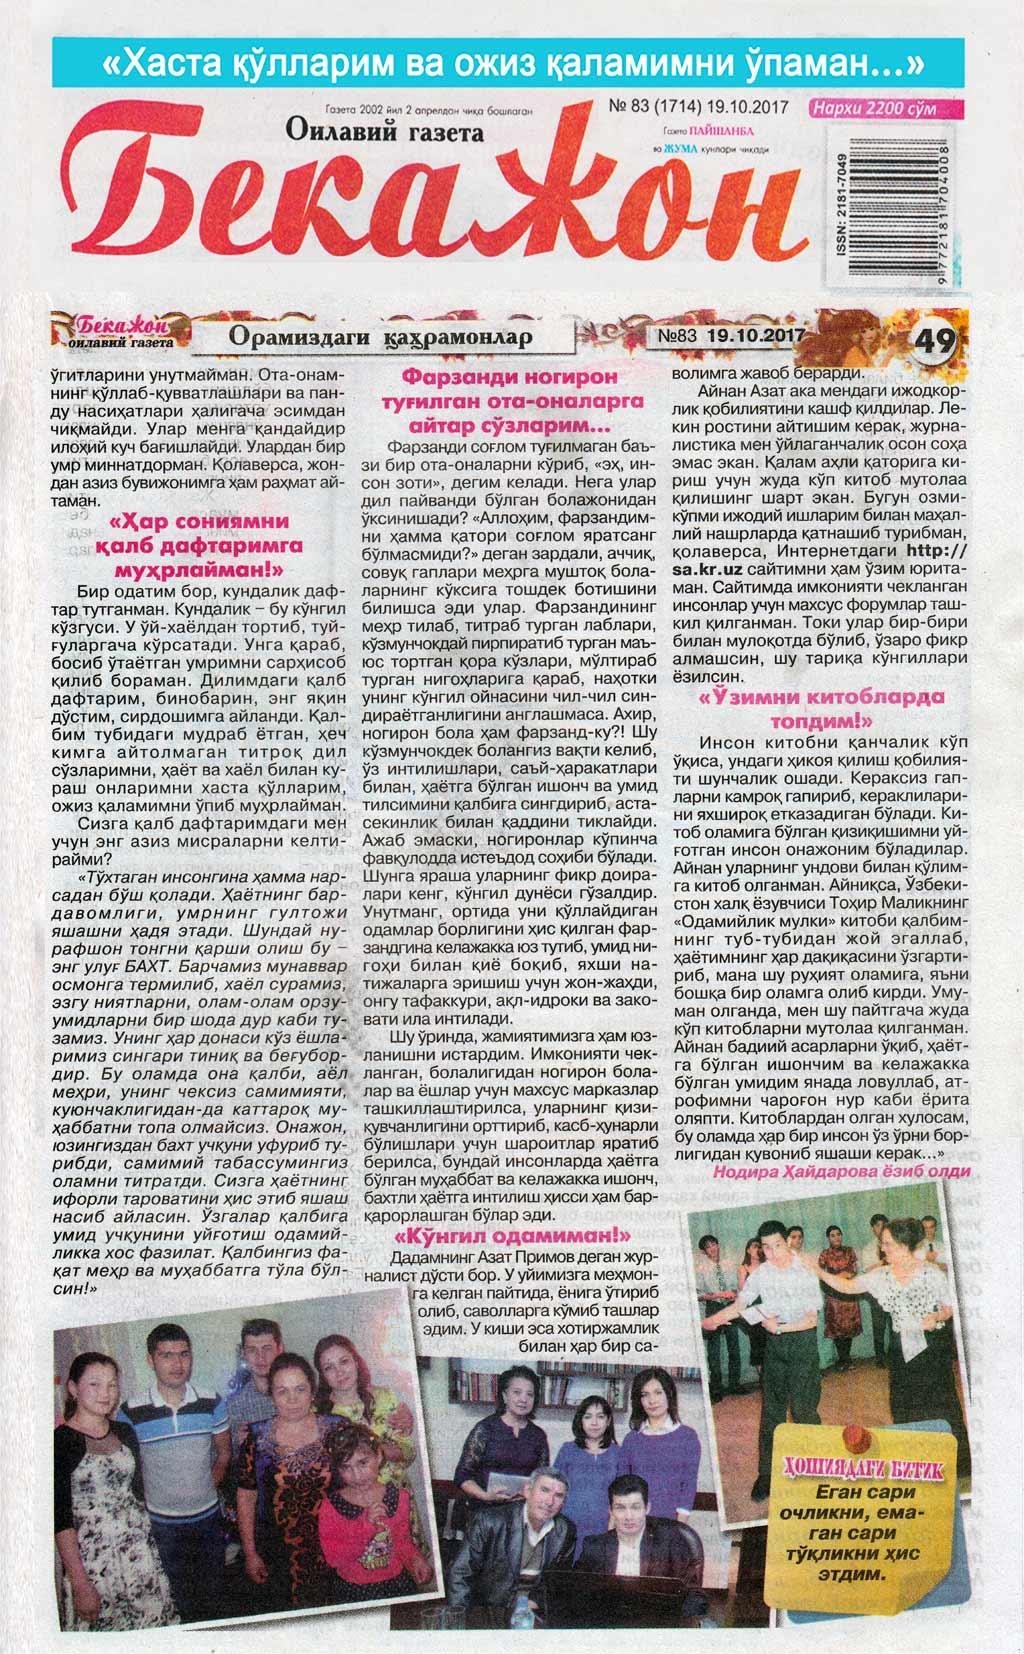 Бекажон Оилавий газета № 83 (1714) 19.10.2017